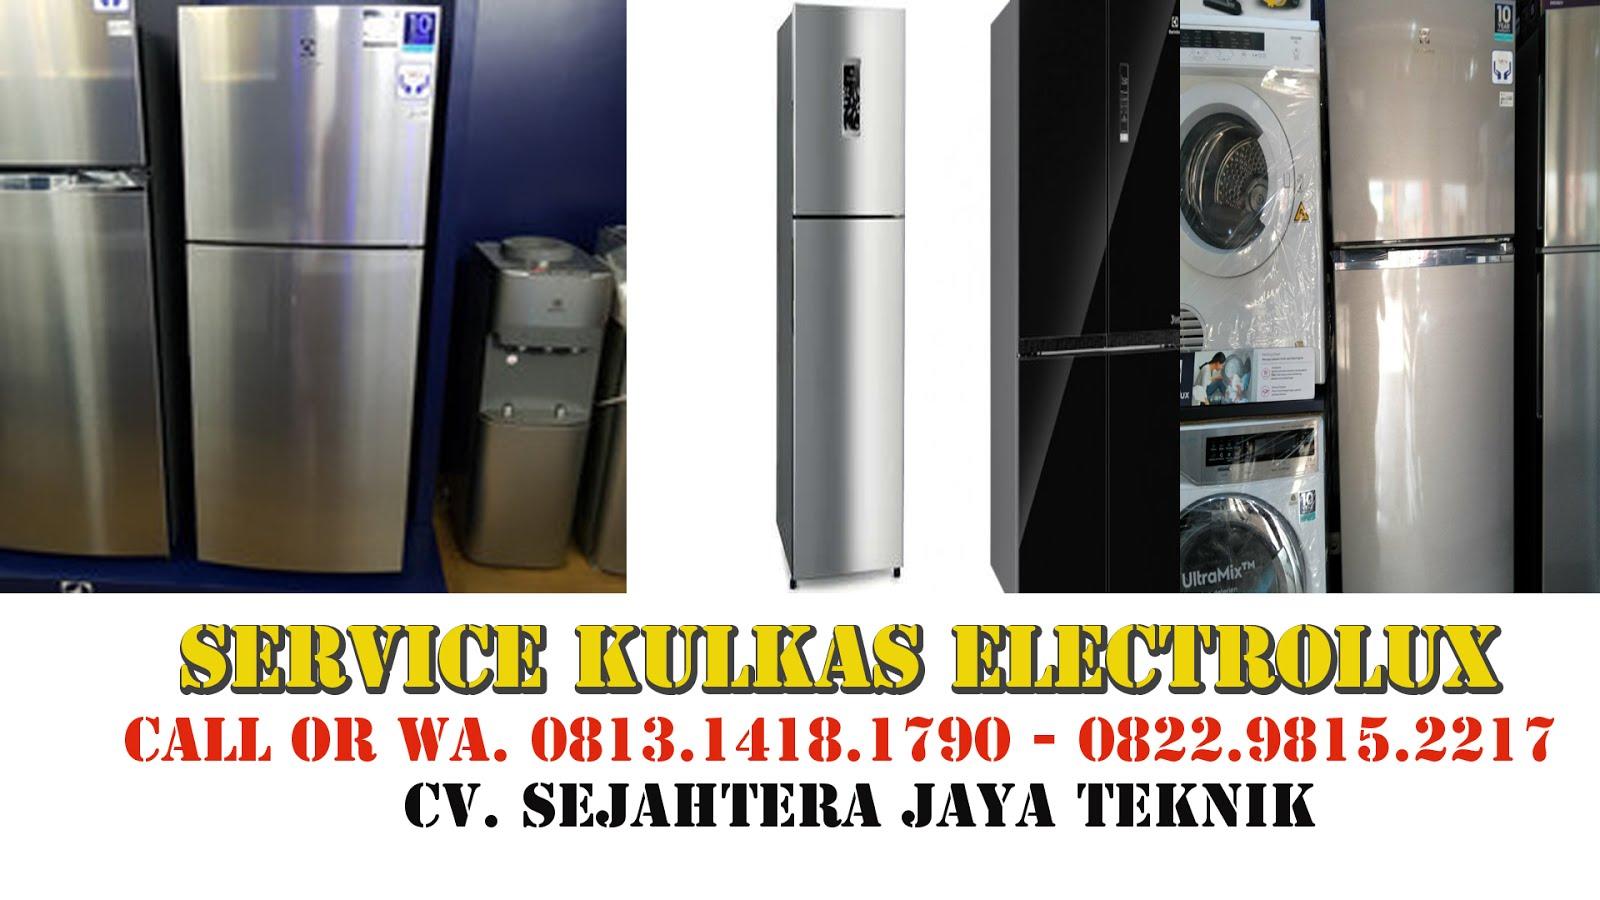 Service Kulkas Electrolux di Jakarta Pusat